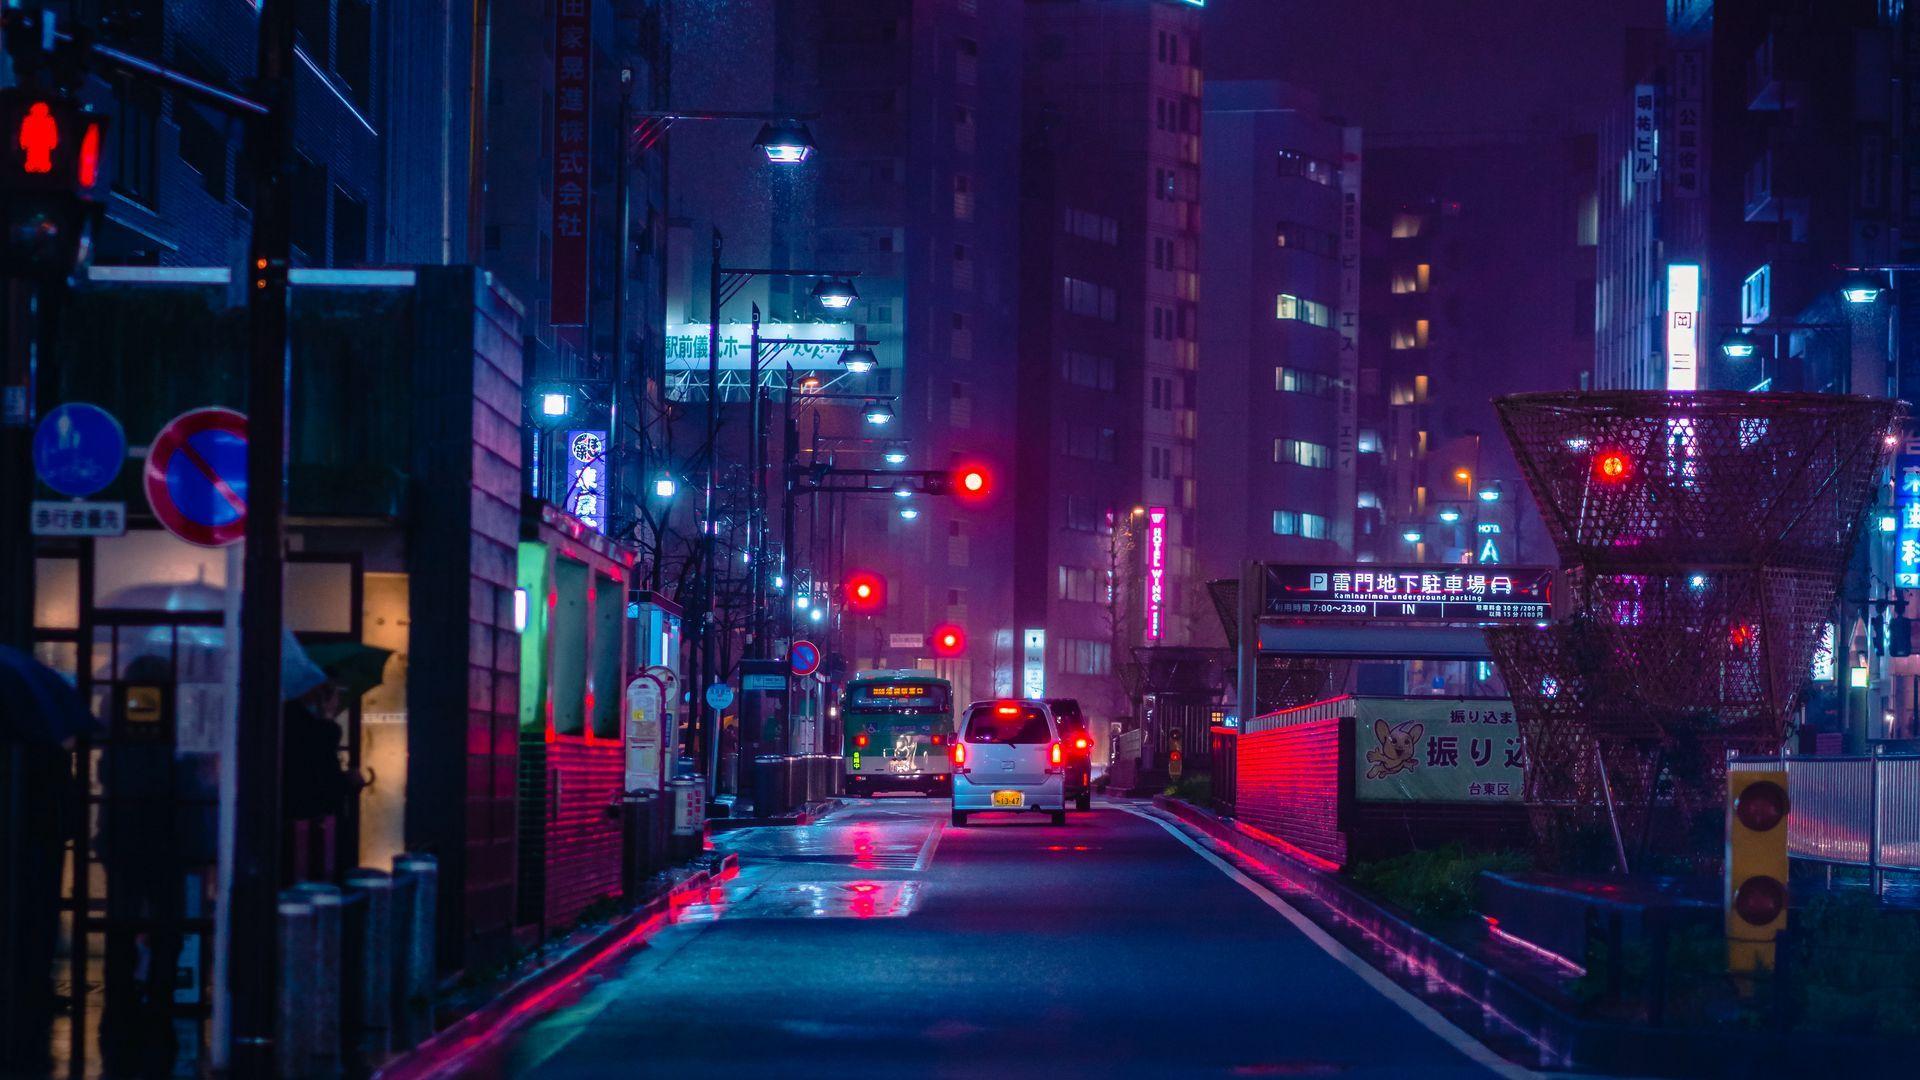 Transit Vehicle On Street Panasonic Dmc Gh3 Eff8fc Wallpaper Hd Wallpaper City Background